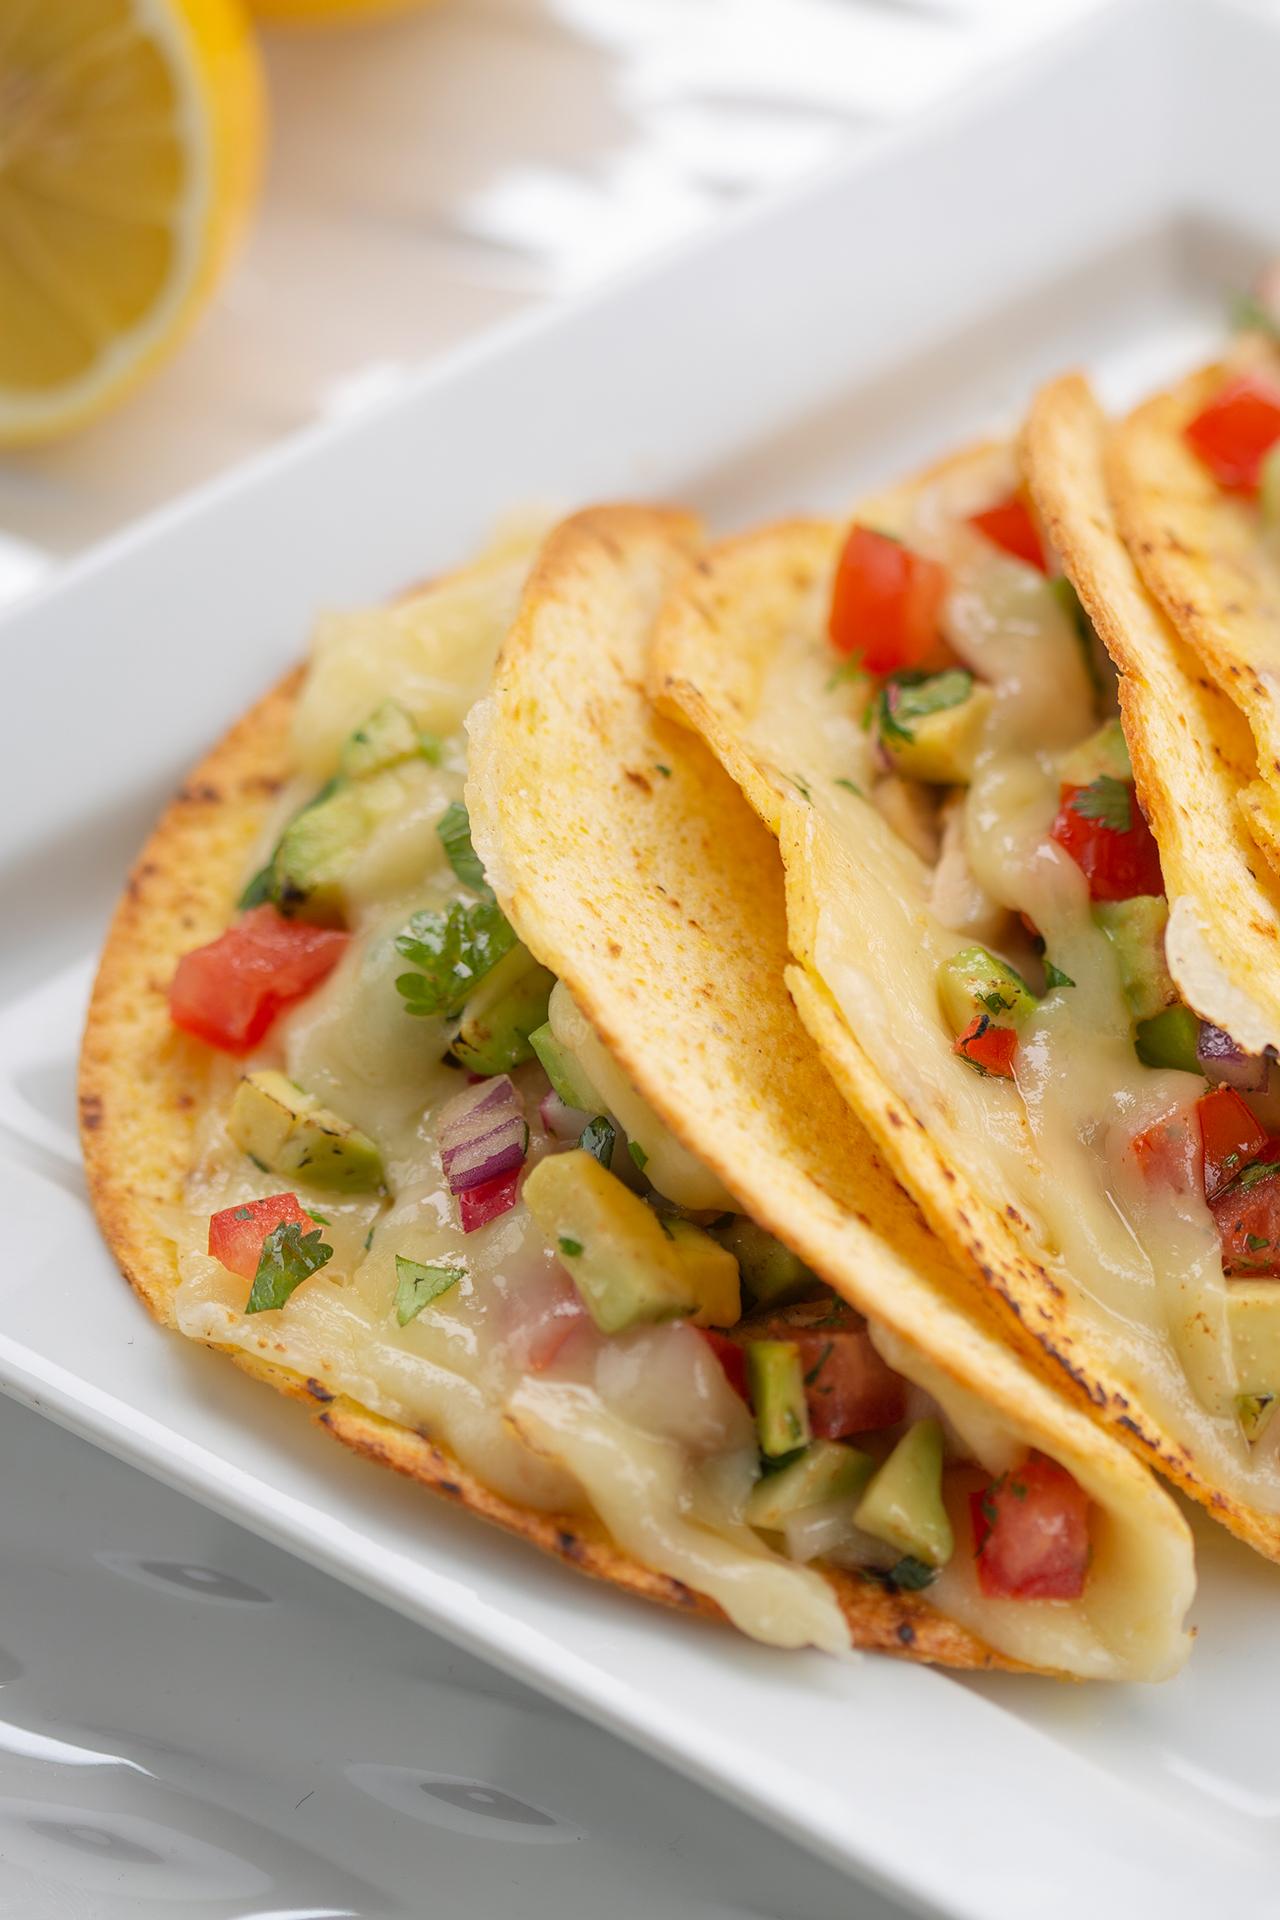 Charmidor and avocado tacos style